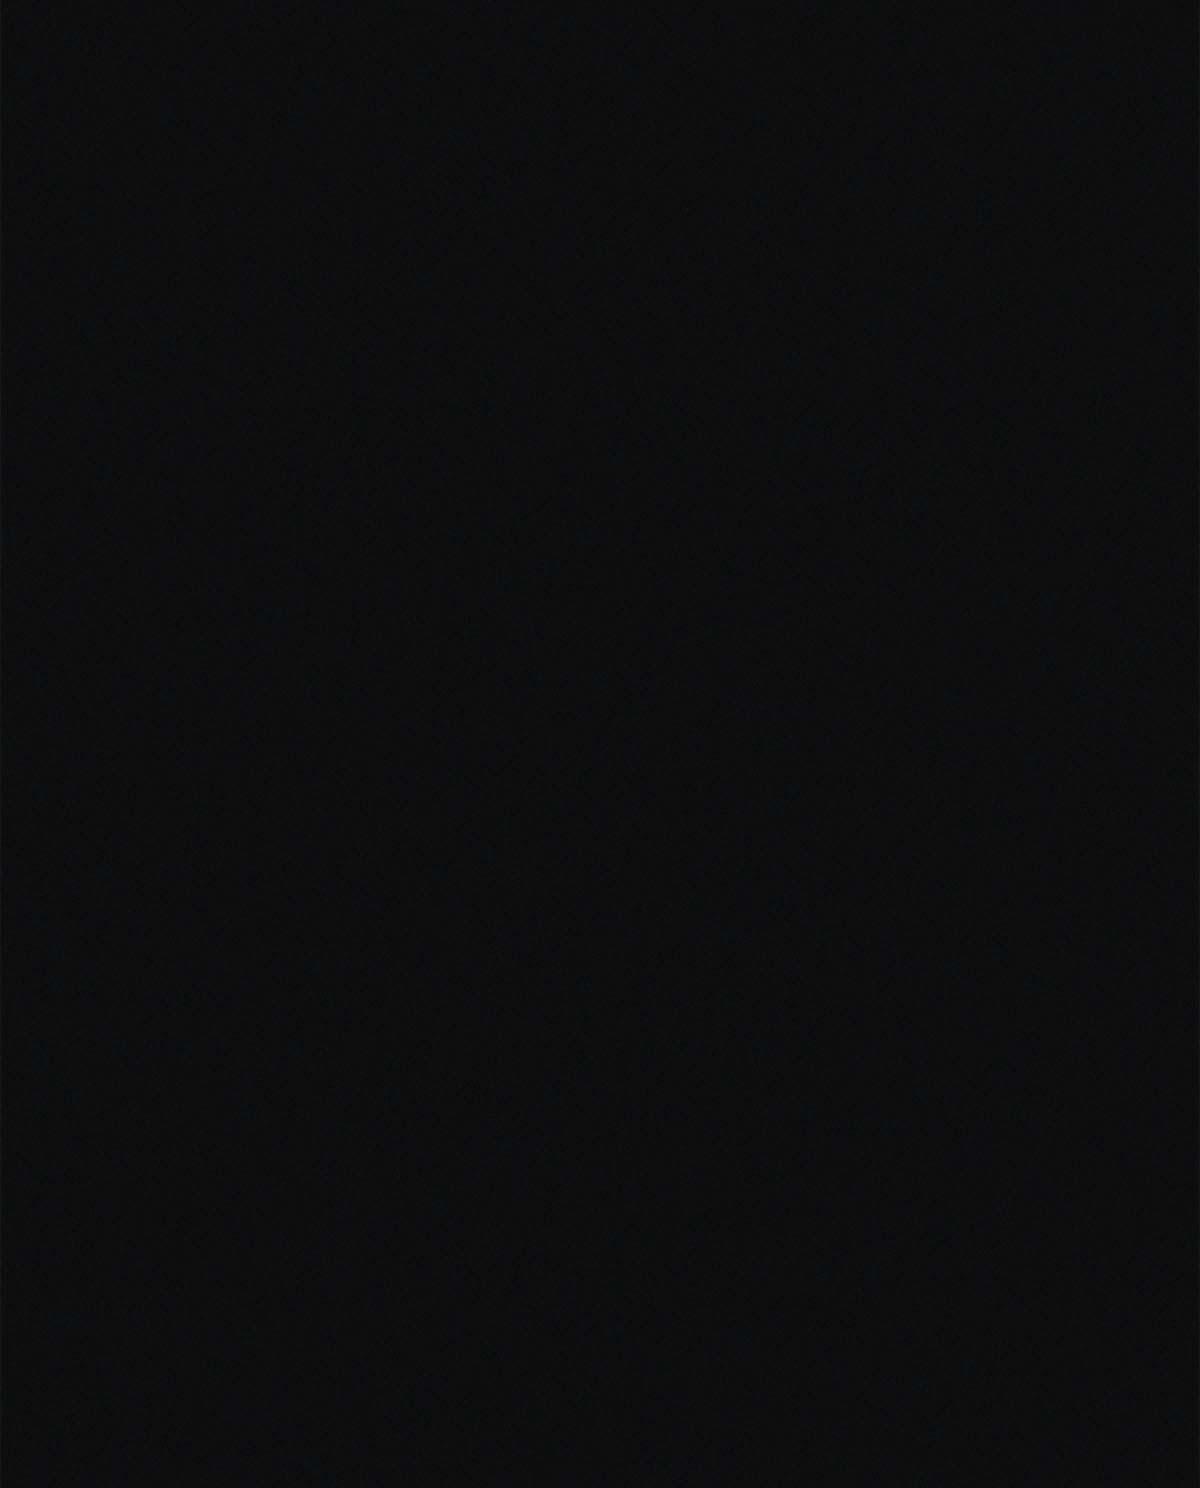 25.-Zwart-gekorreld-kopiëren_V